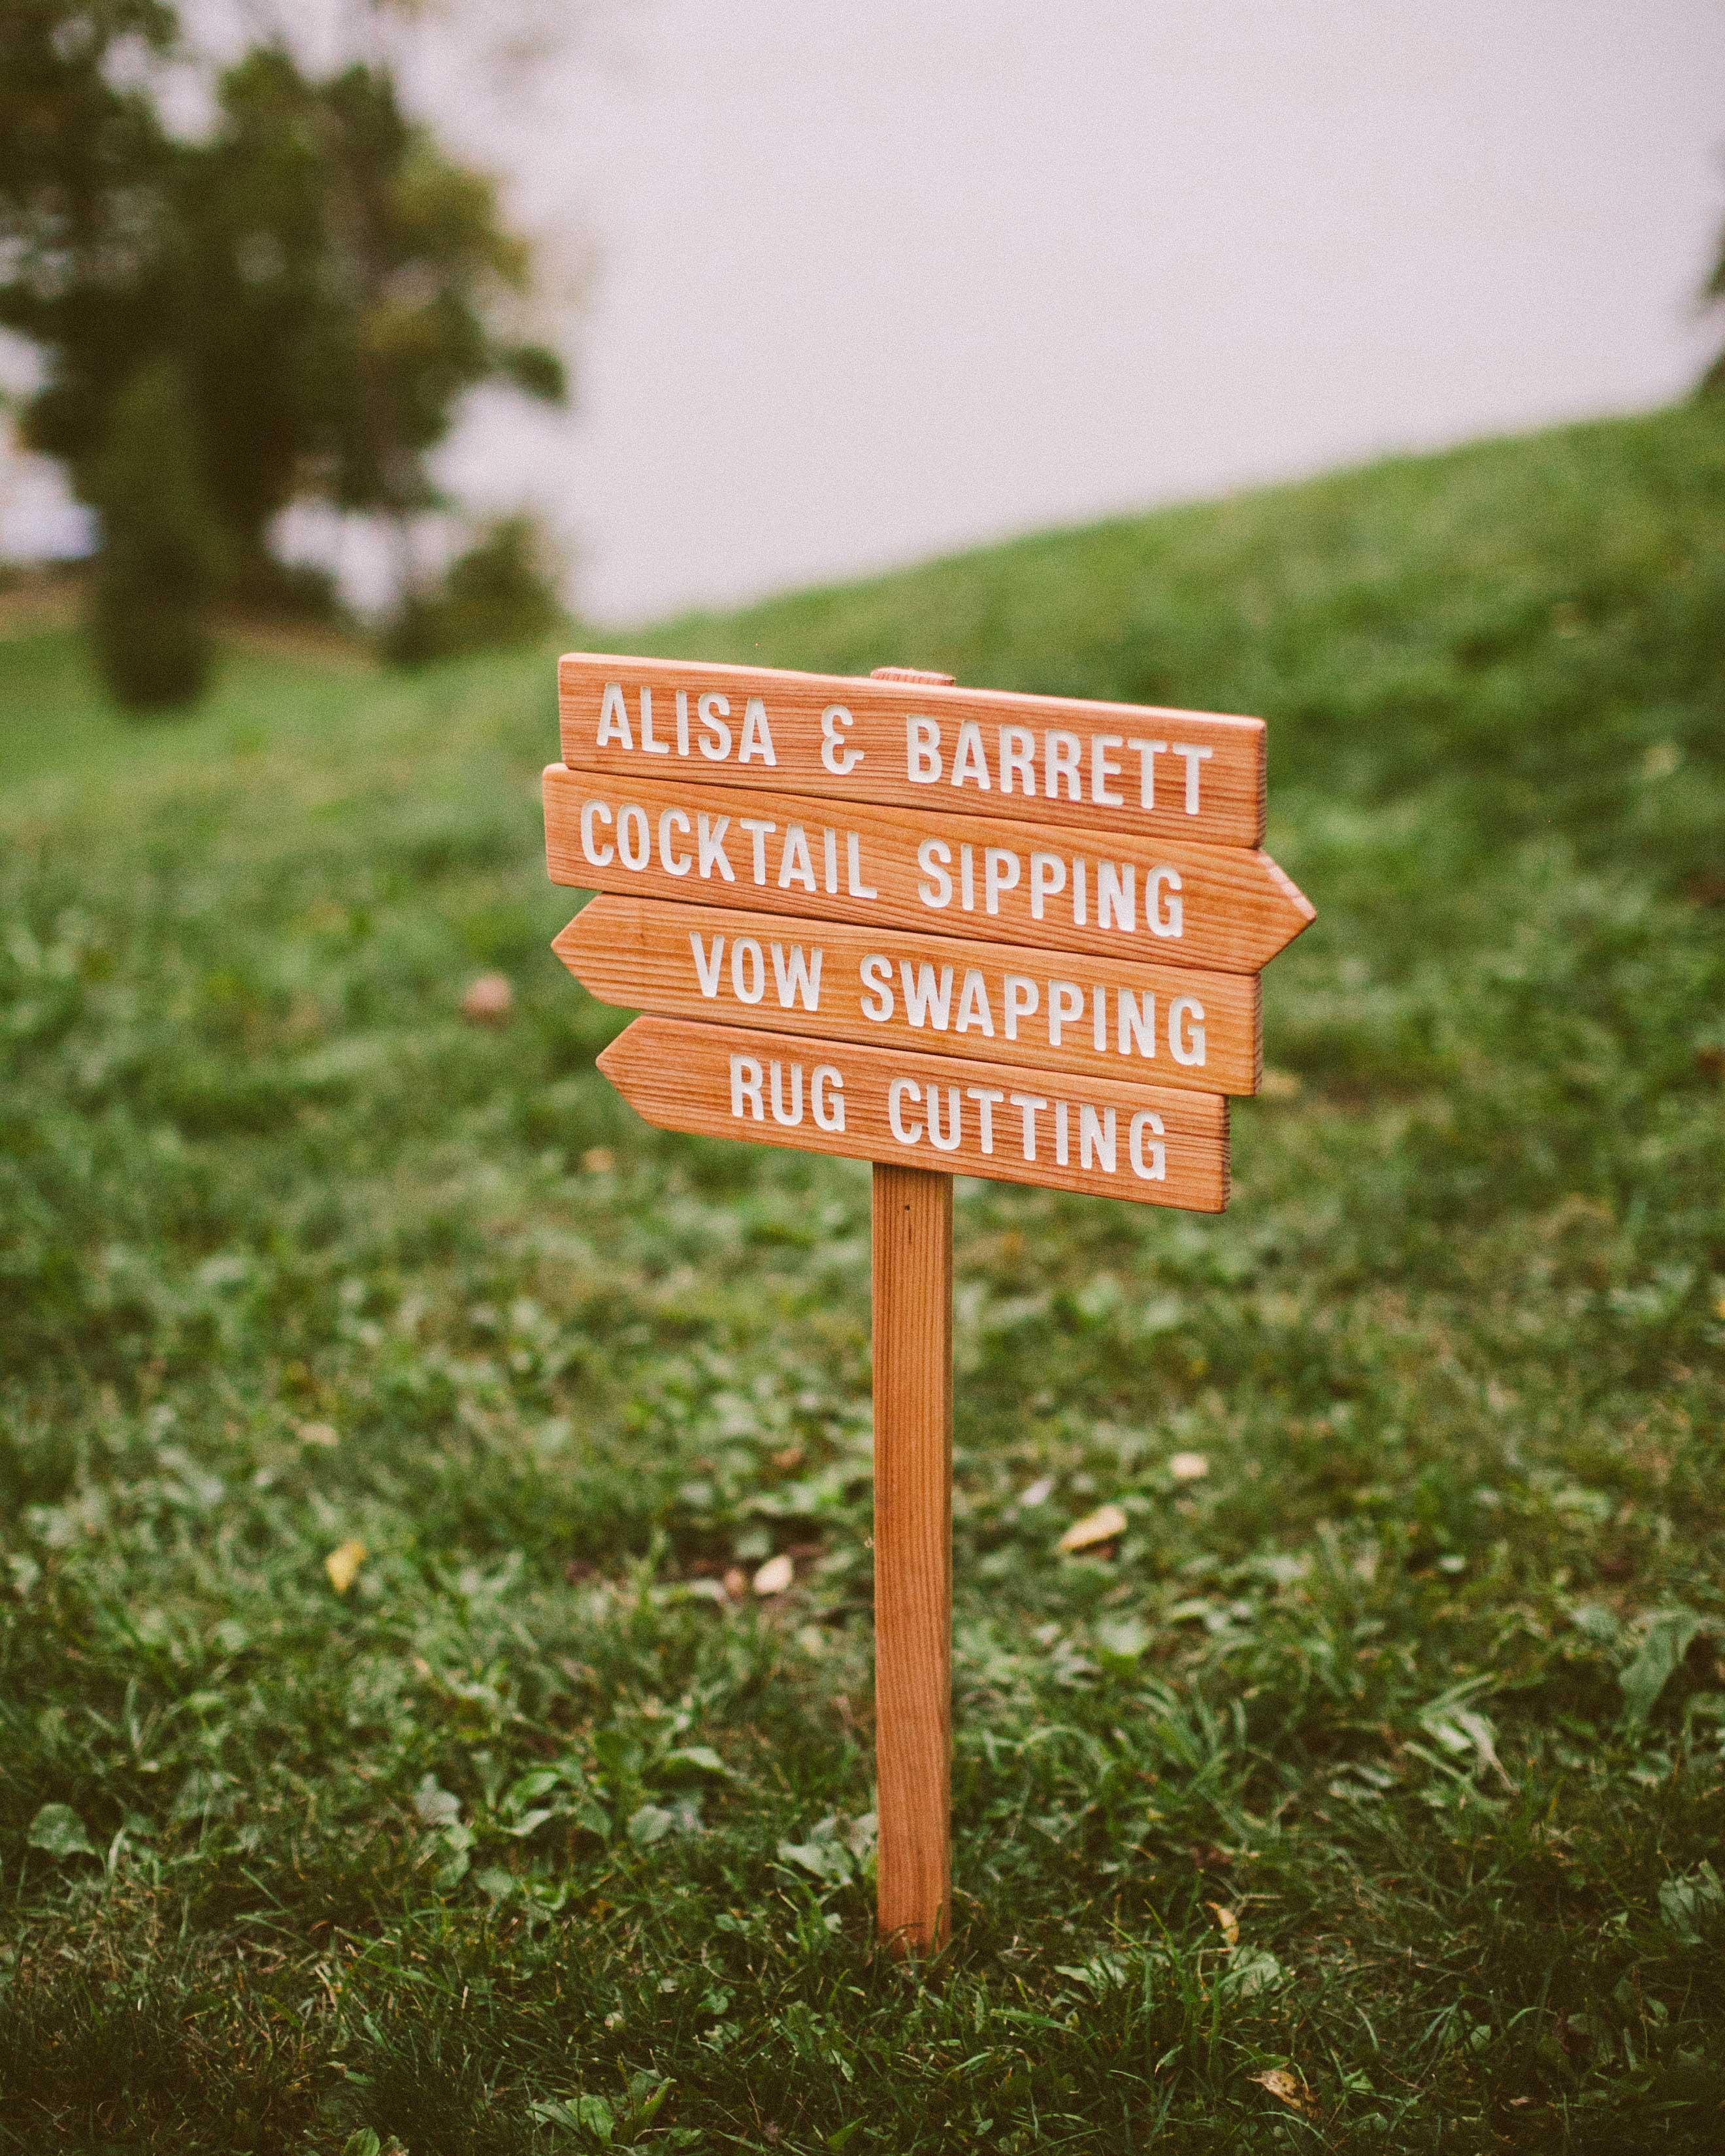 alisa-barrett-wedding-wayfinder-1055-s113048-0716.jpg